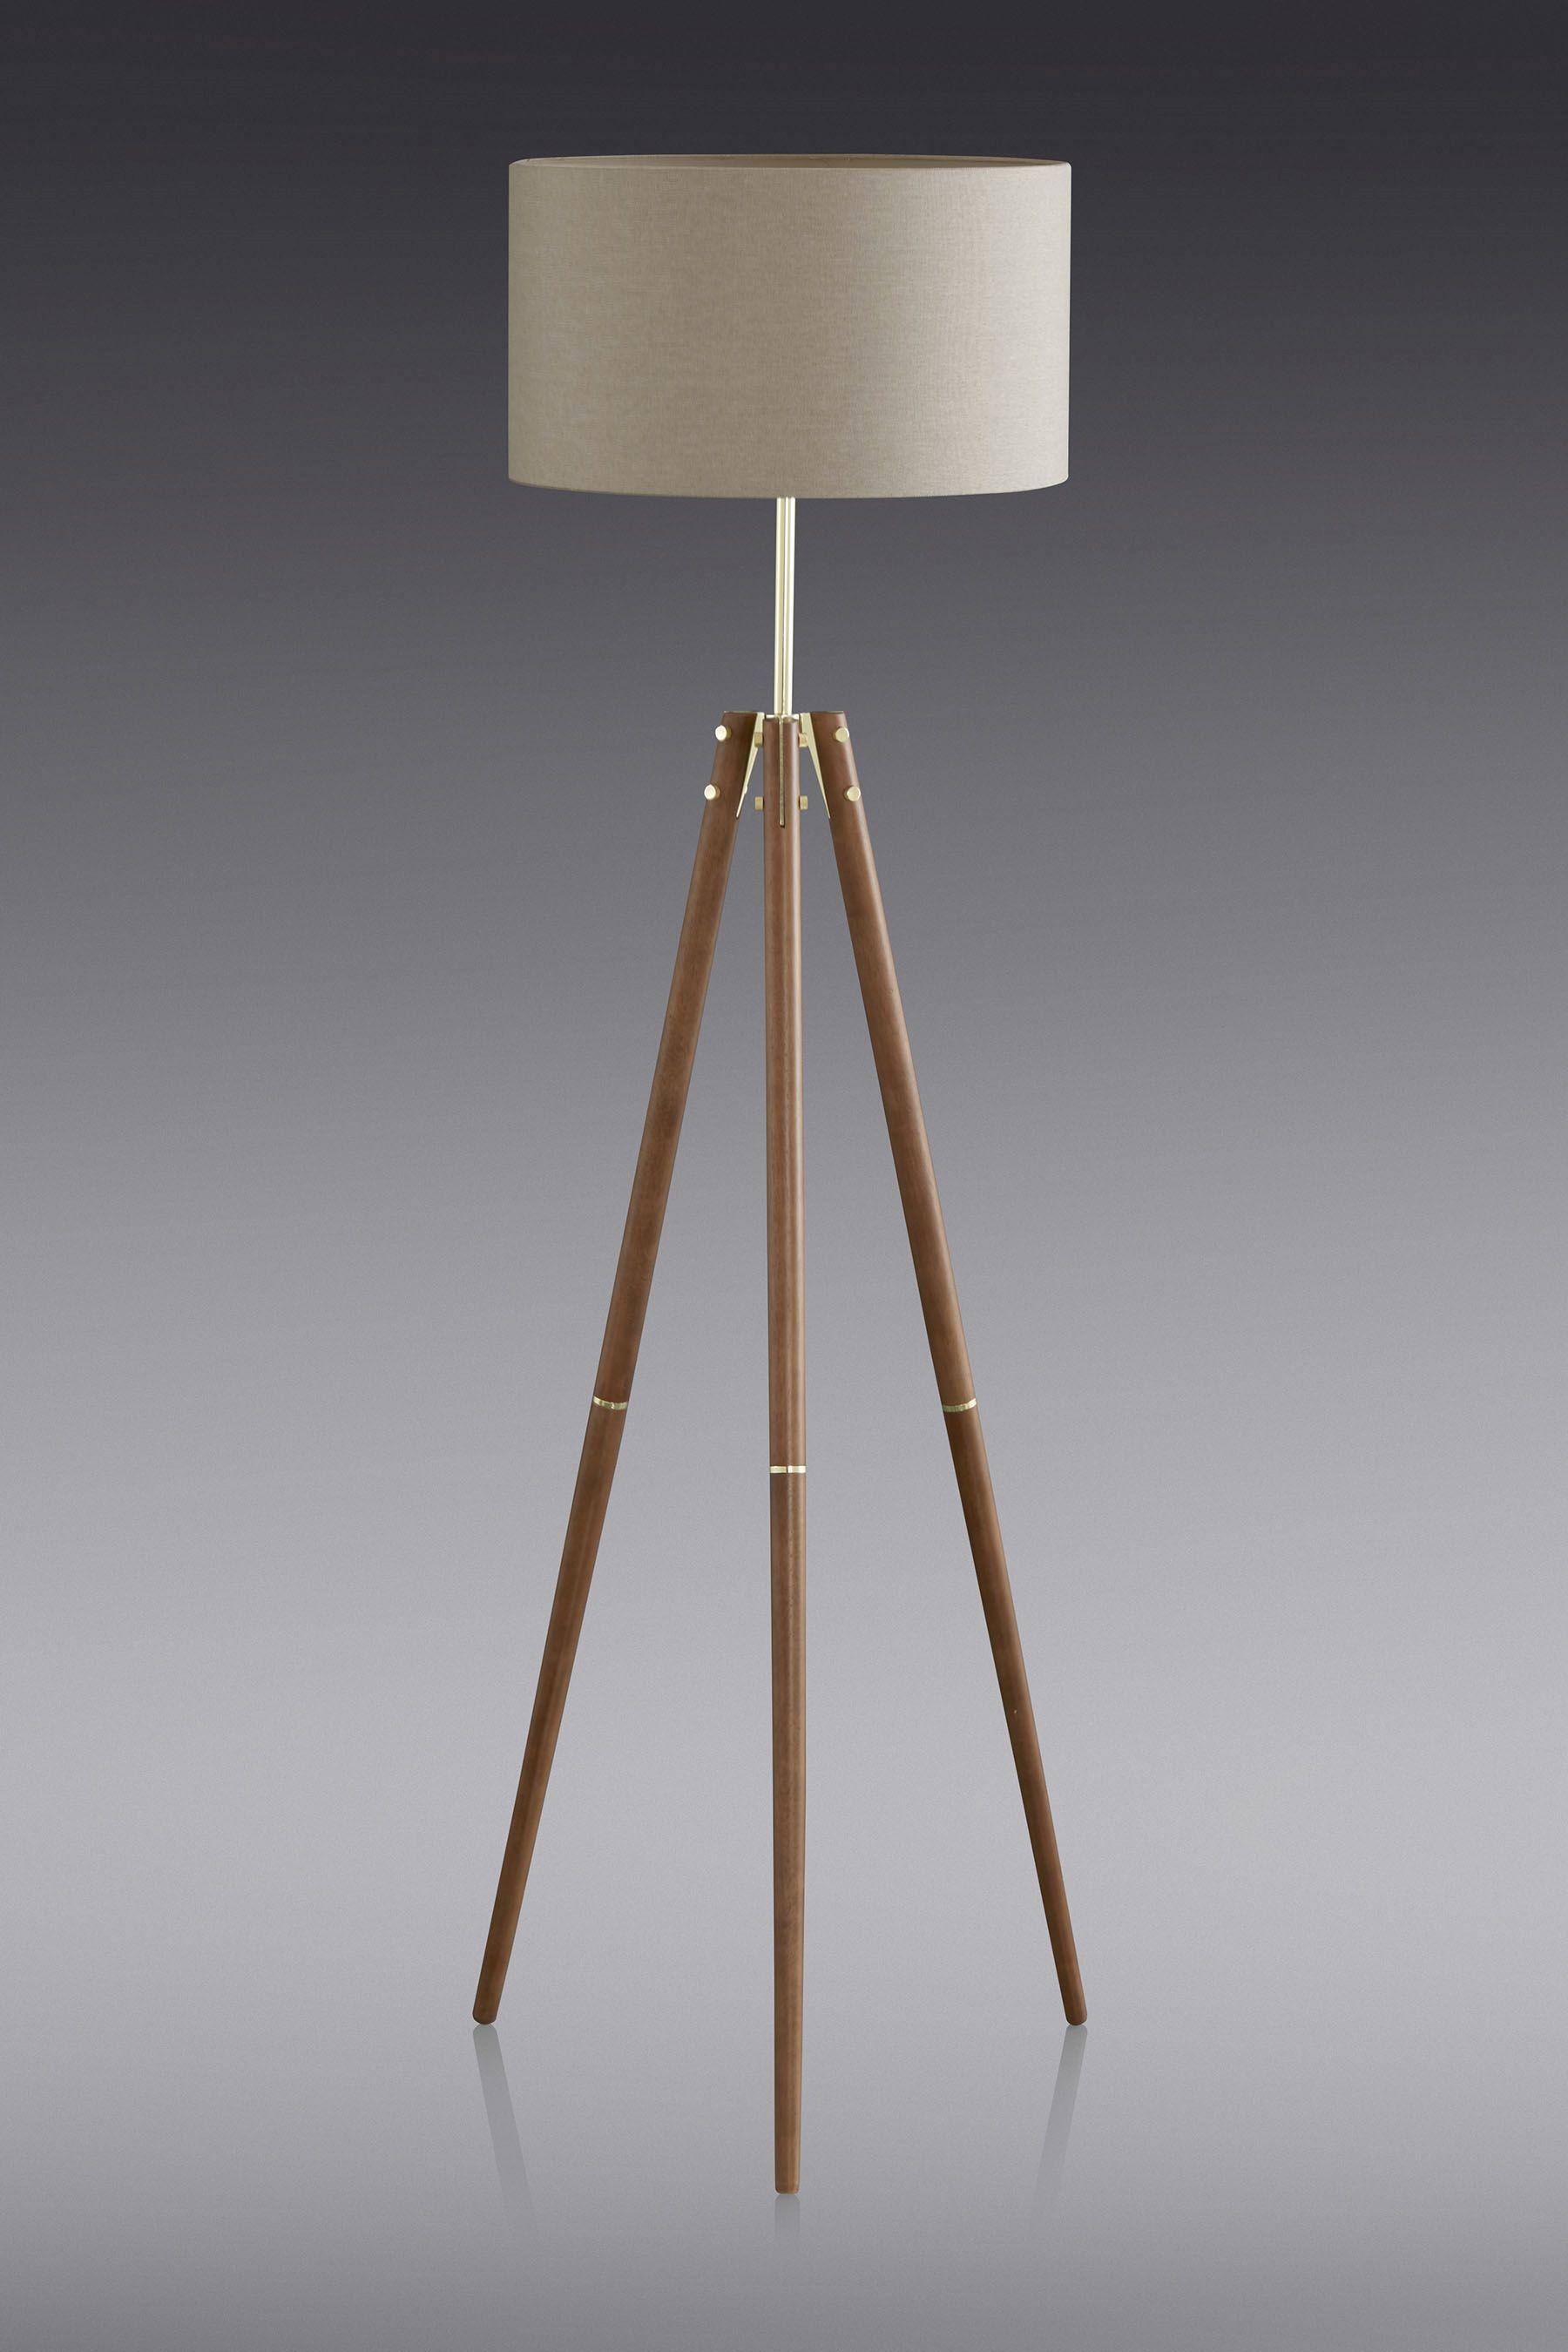 Buy Henley Wooden Tripod Floor Lamp from the Next UK